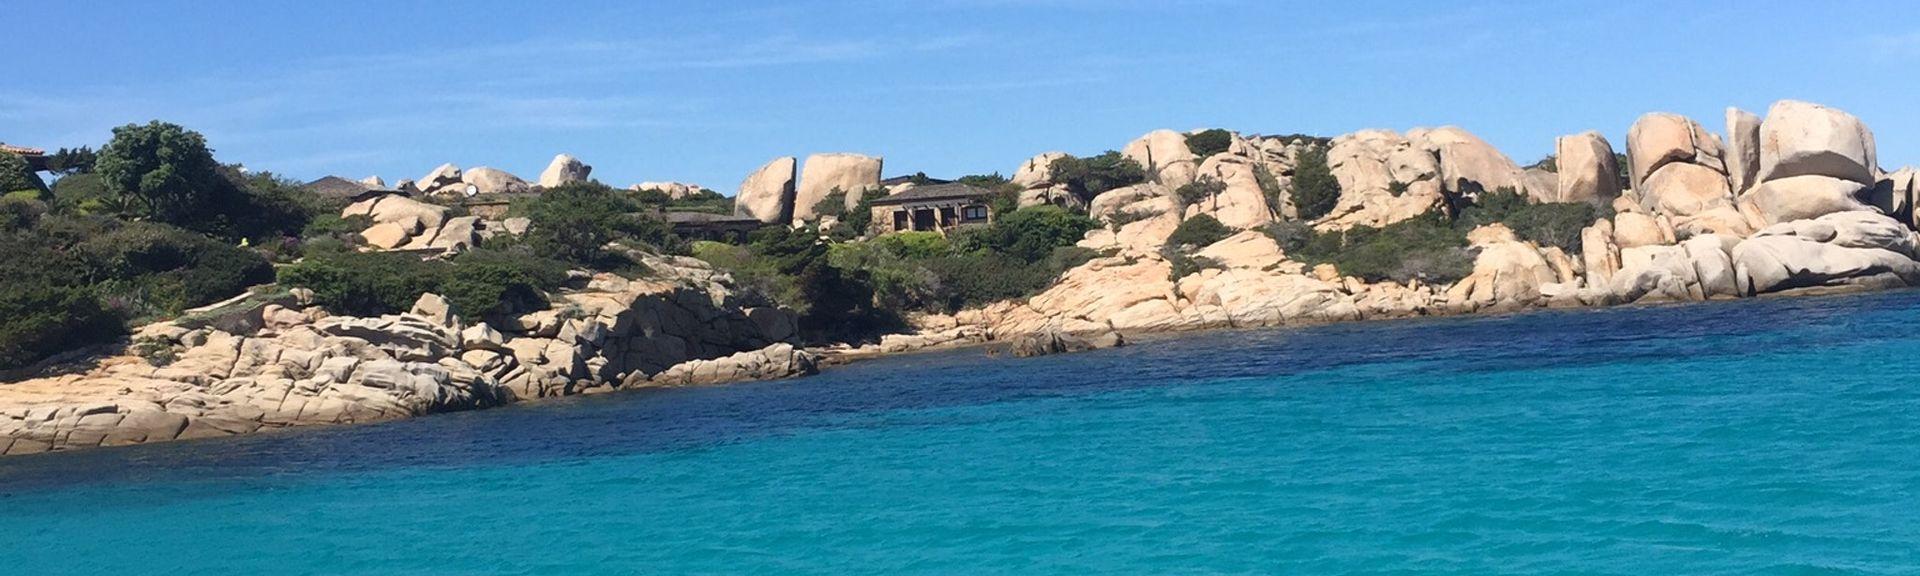 Ghisoni, Haute-Corse, France